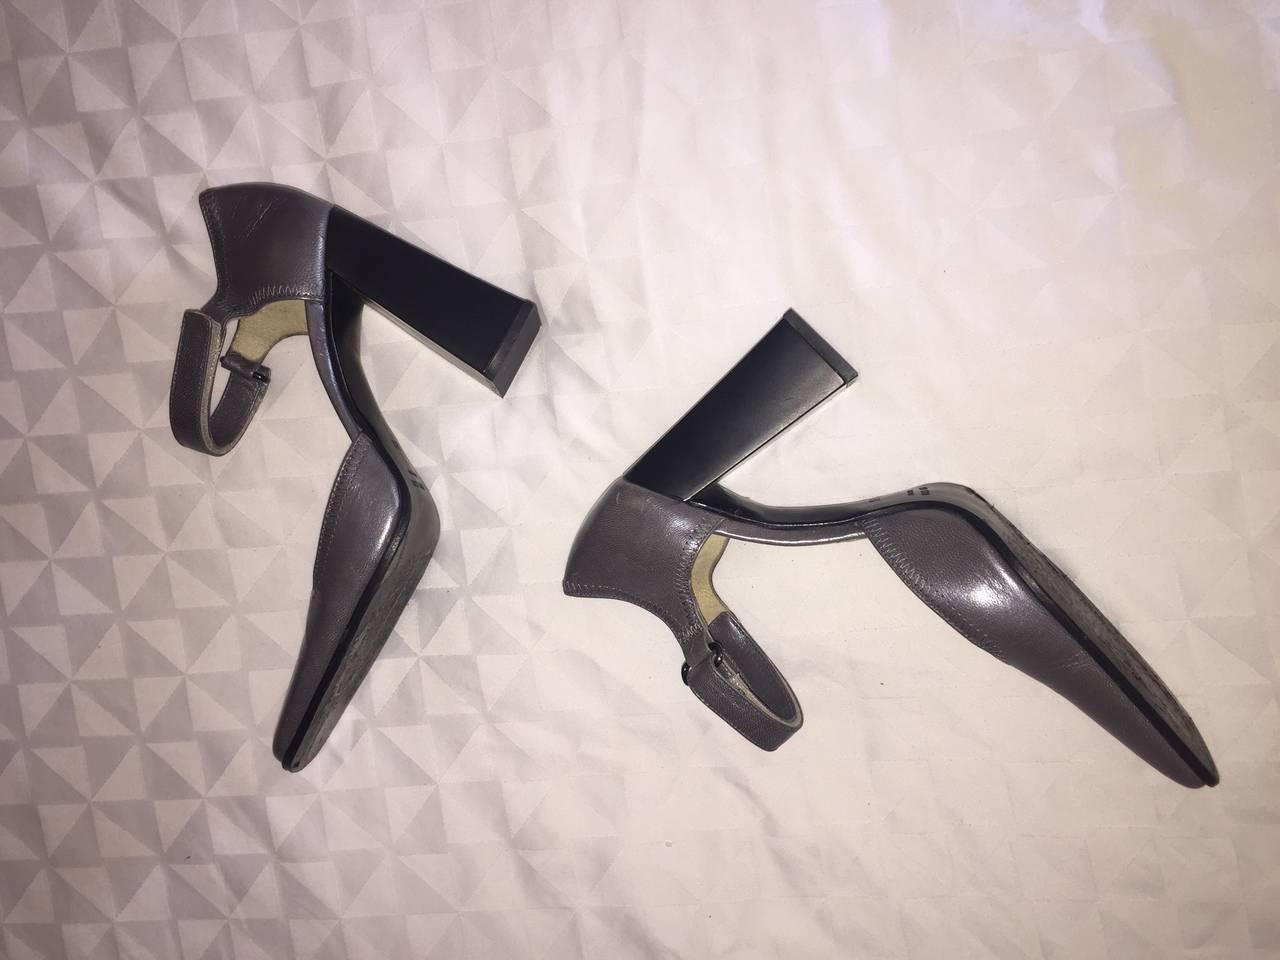 Rare 1990s Vintage Miu Miu ' Architectural ' Gunmetal Block Heels / Shoes 36.5 8